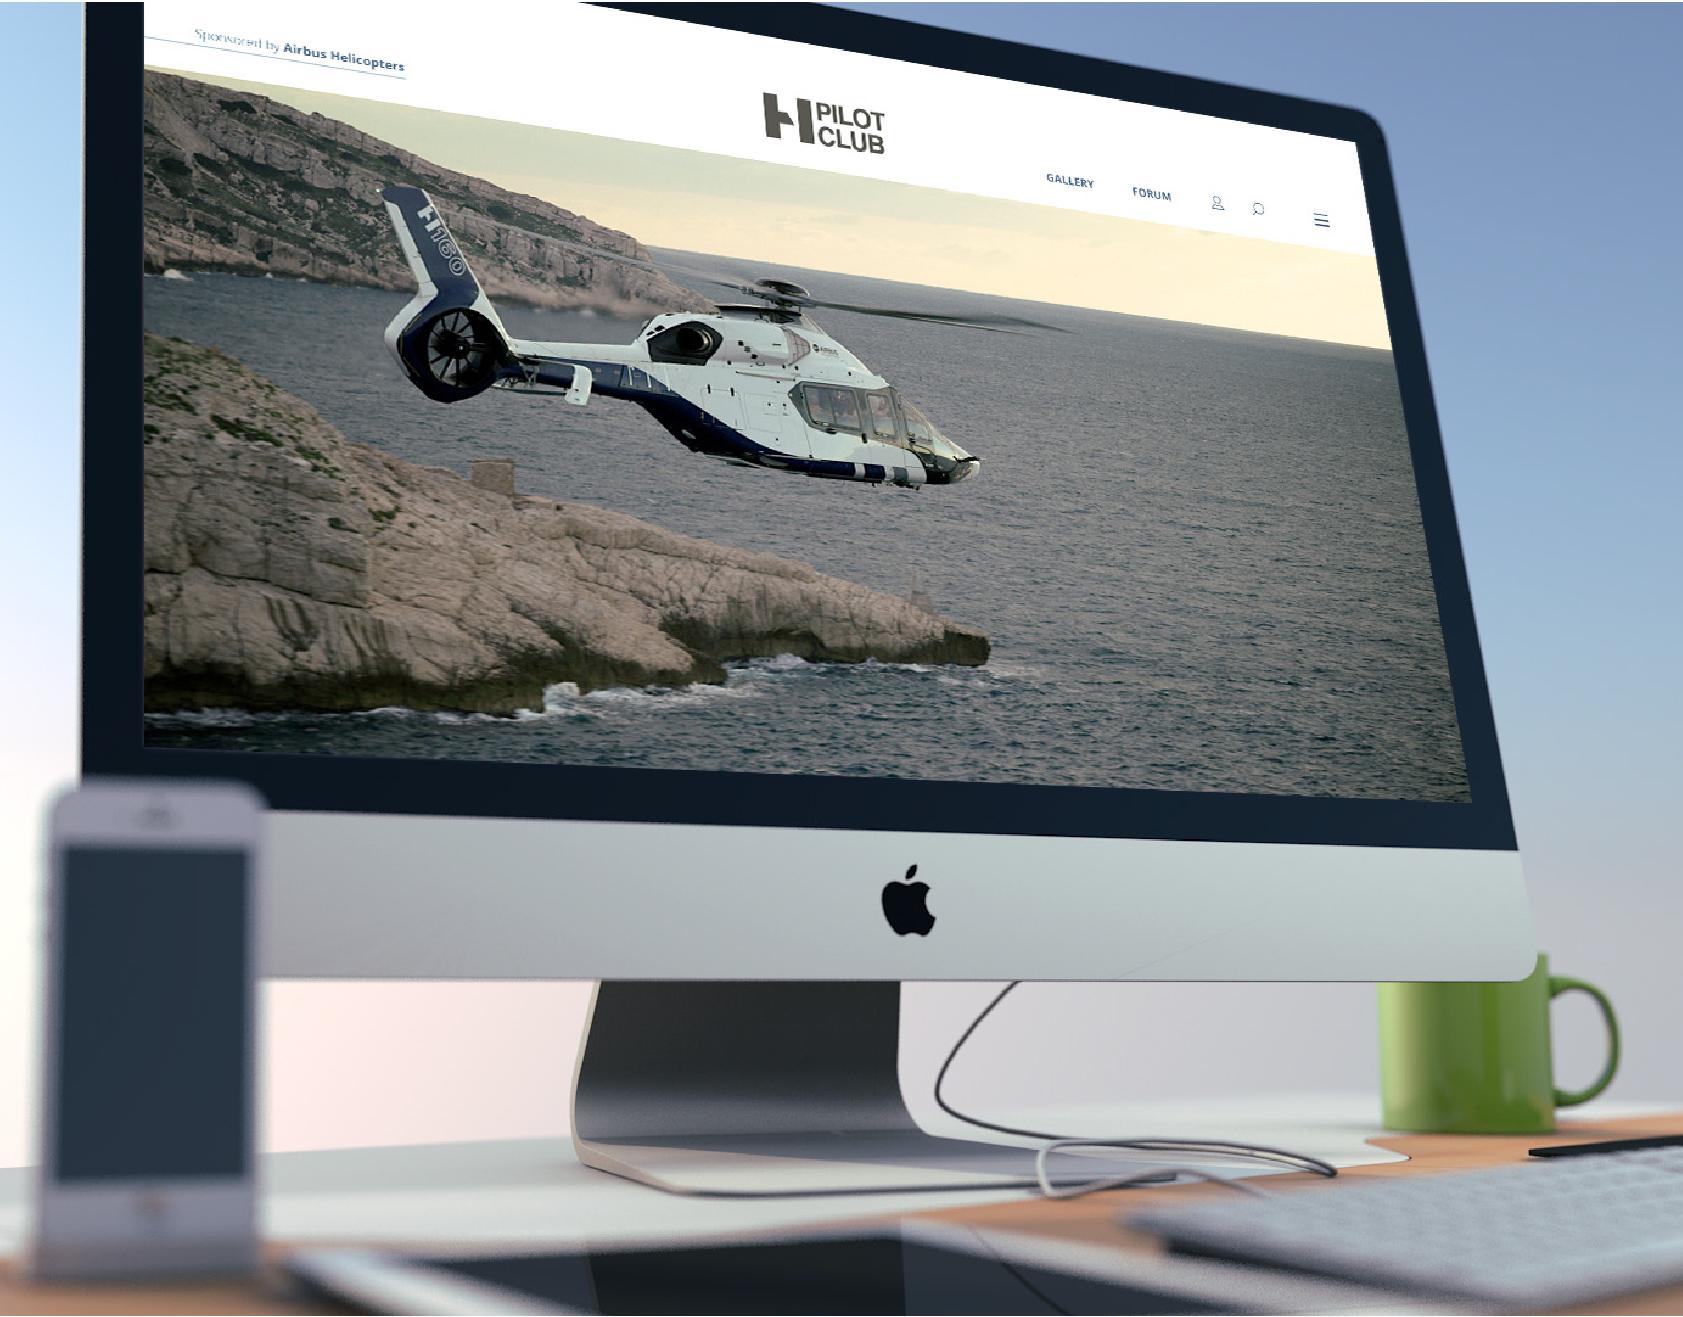 Webdesign - H Pilot Club